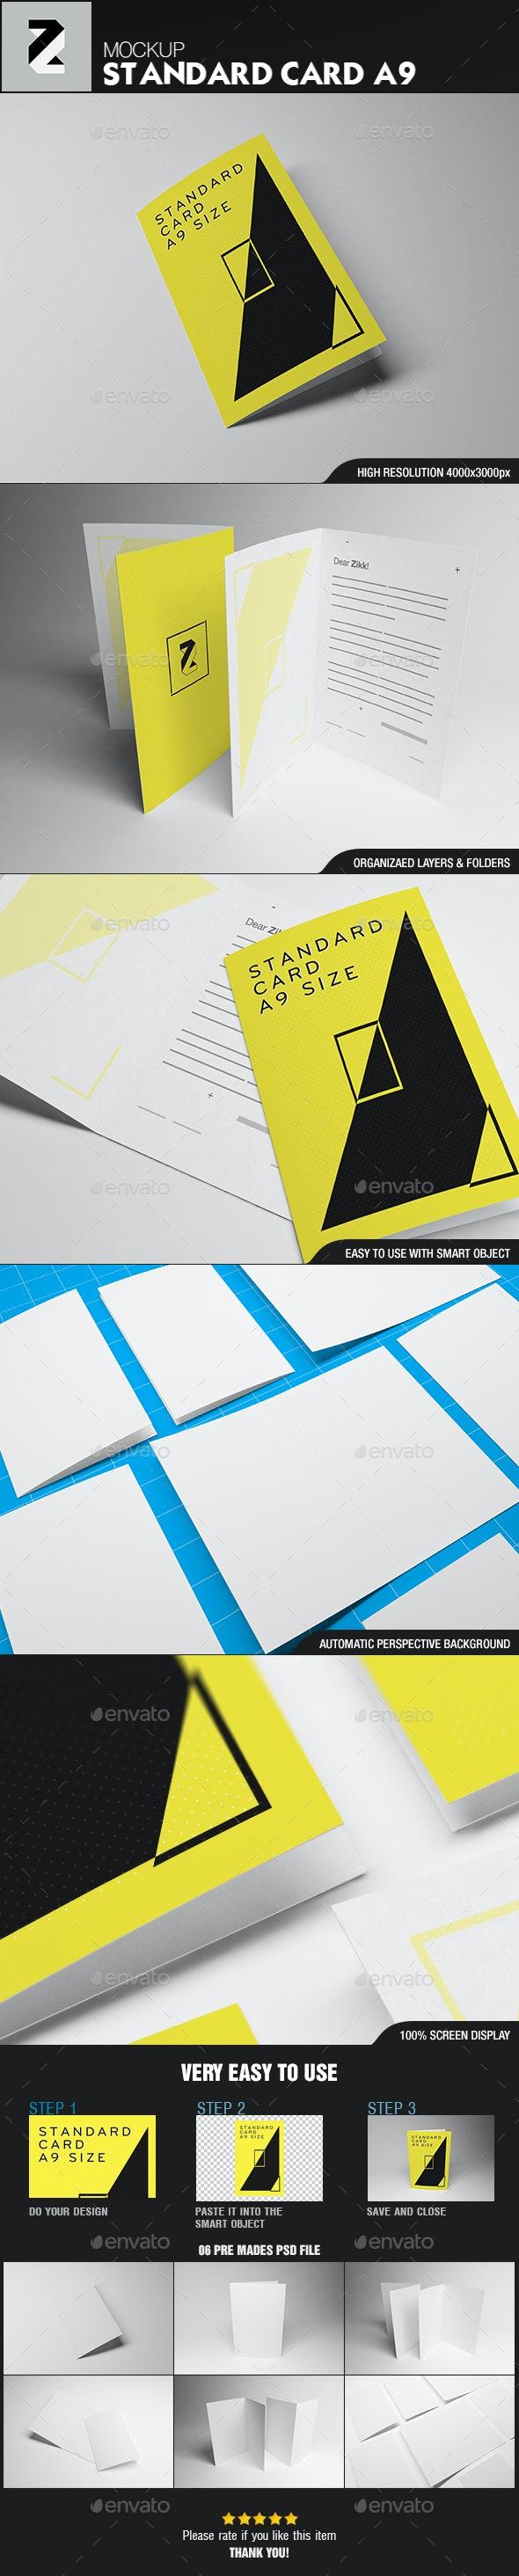 Standard Card Brochure A9 Mockup - Brochures Print